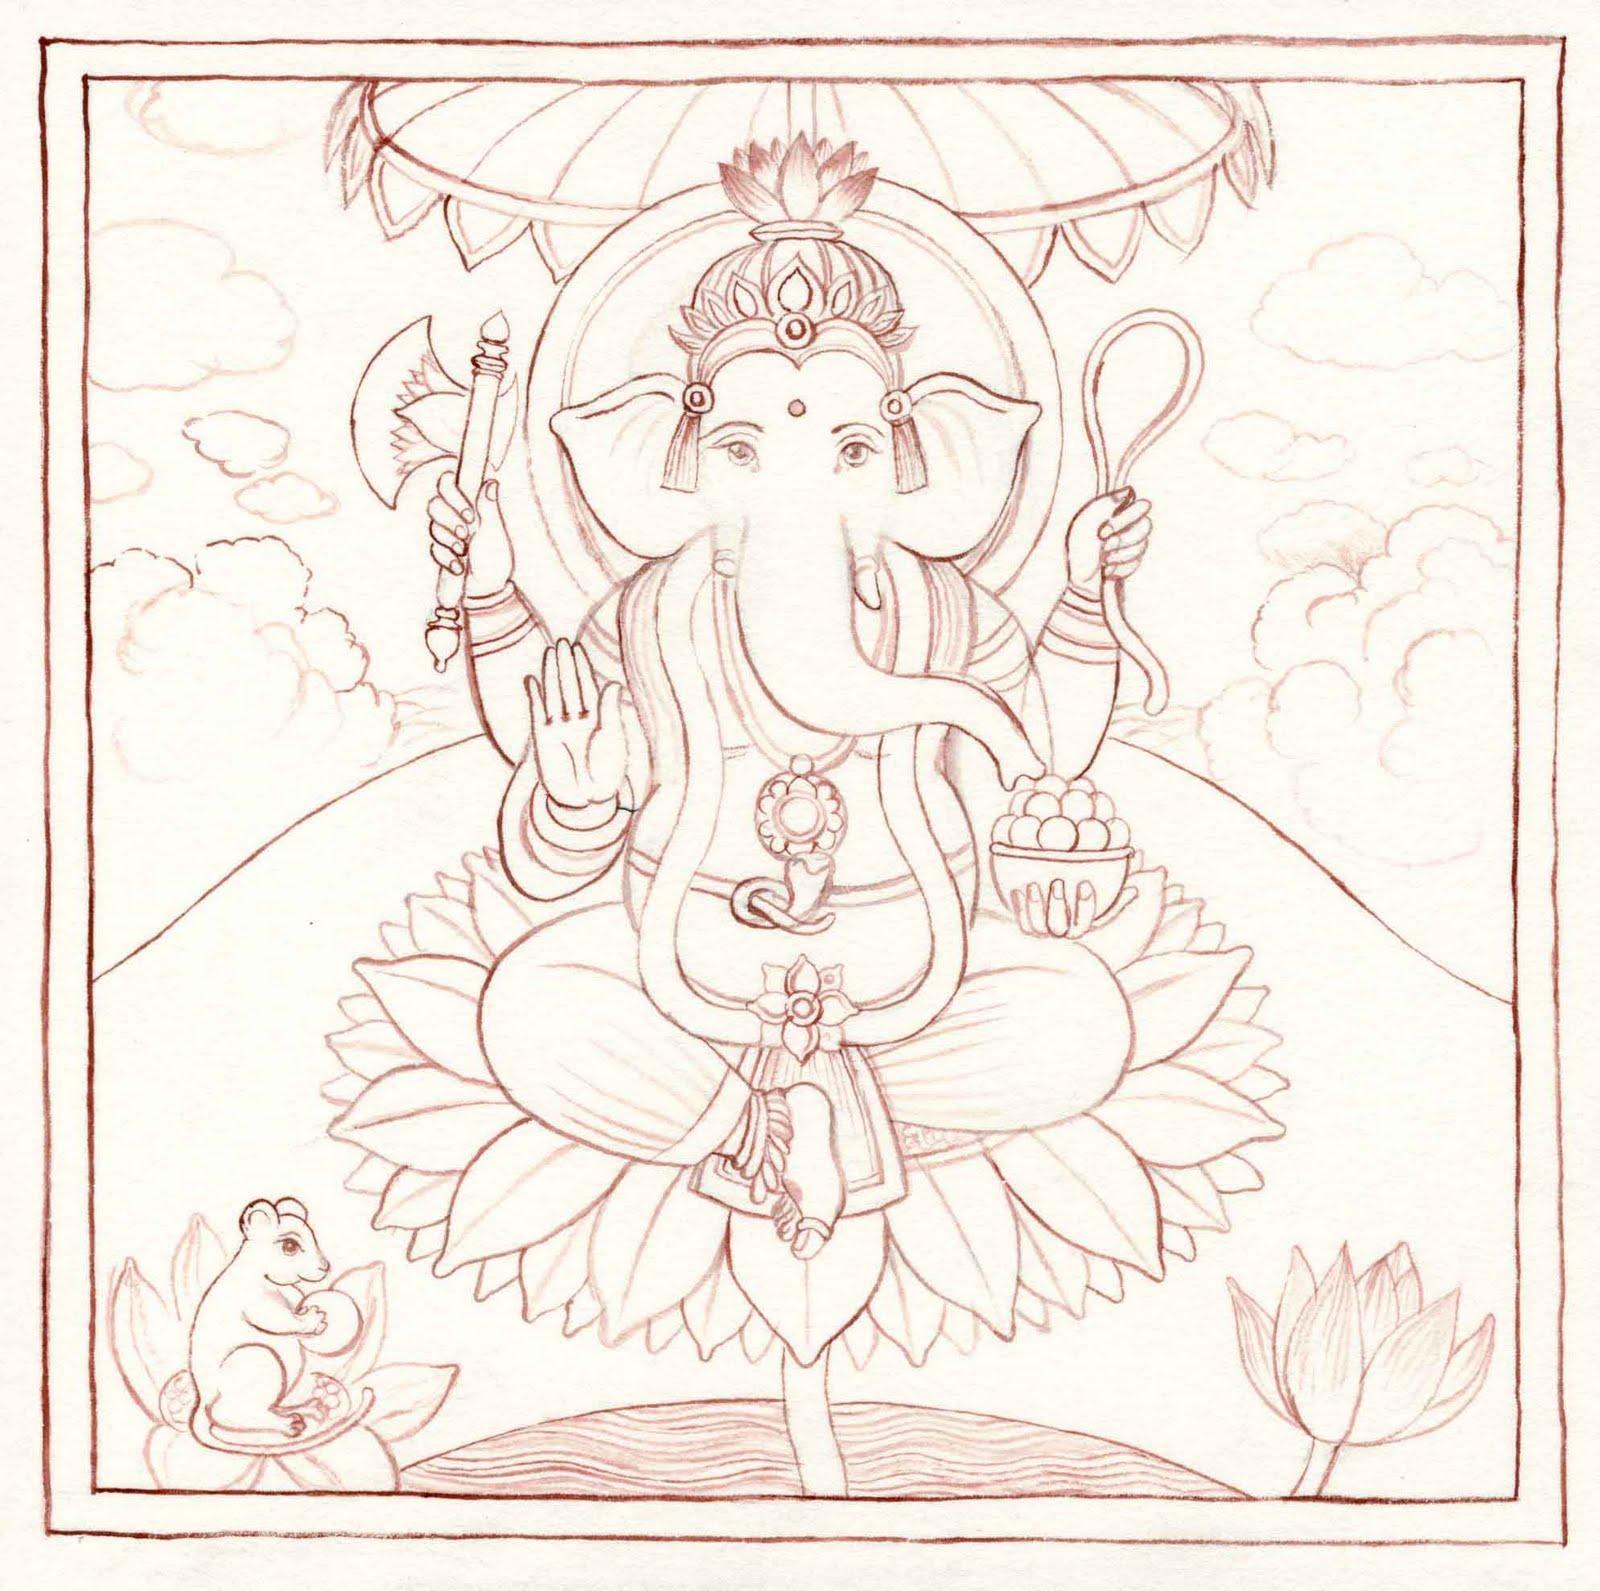 Ganesh Drawing Today being ganesha chaturthi,